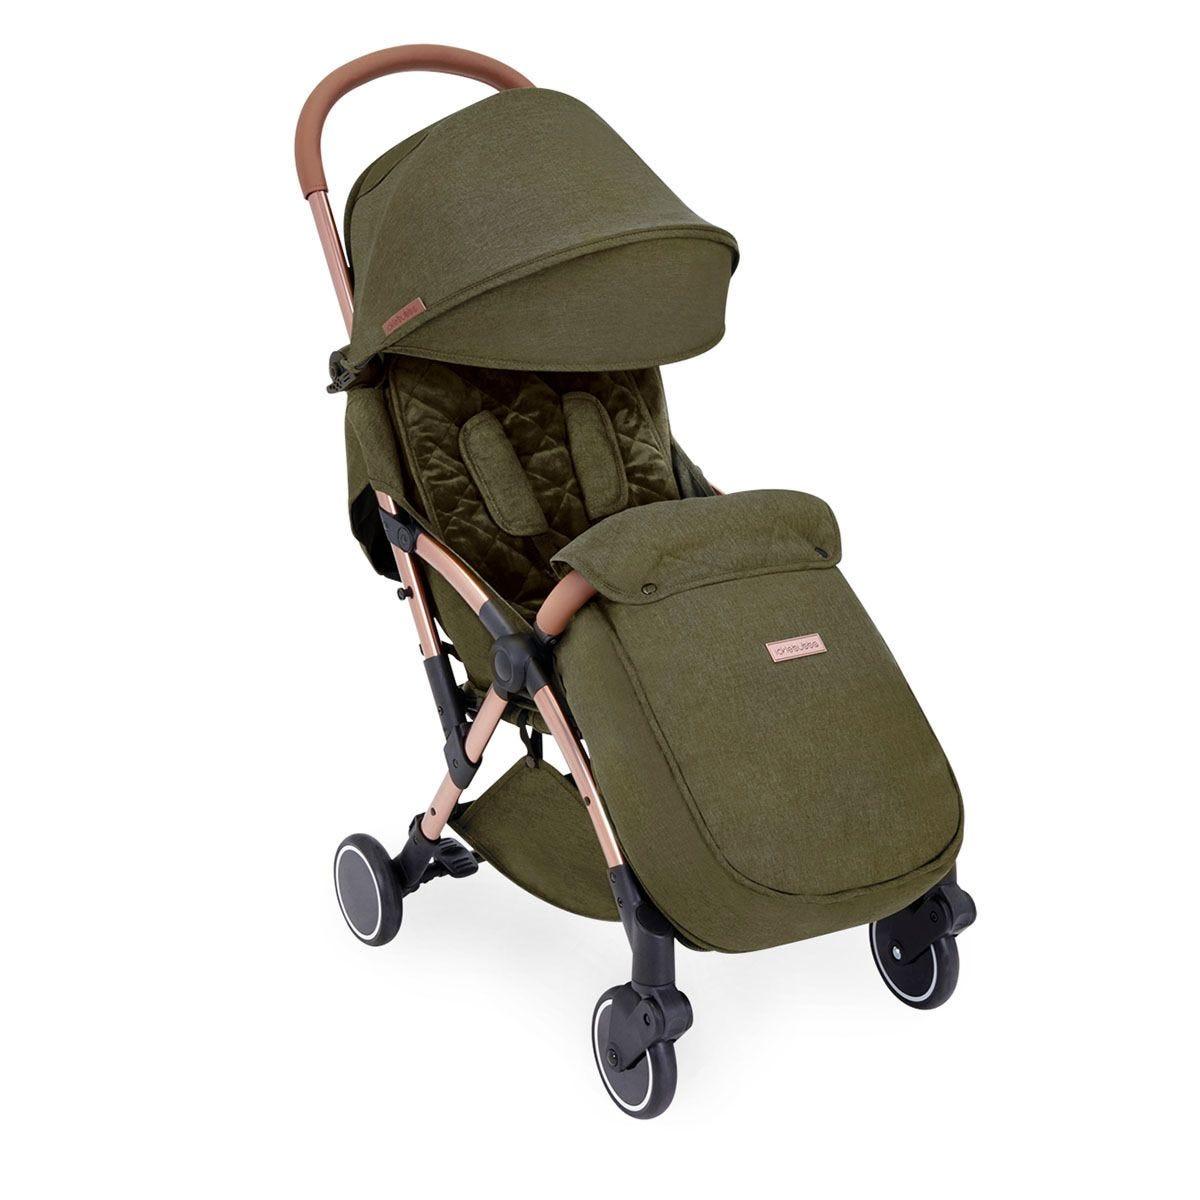 Ickle Bubba Globe Prime Stroller - Khaki on Rose Gold